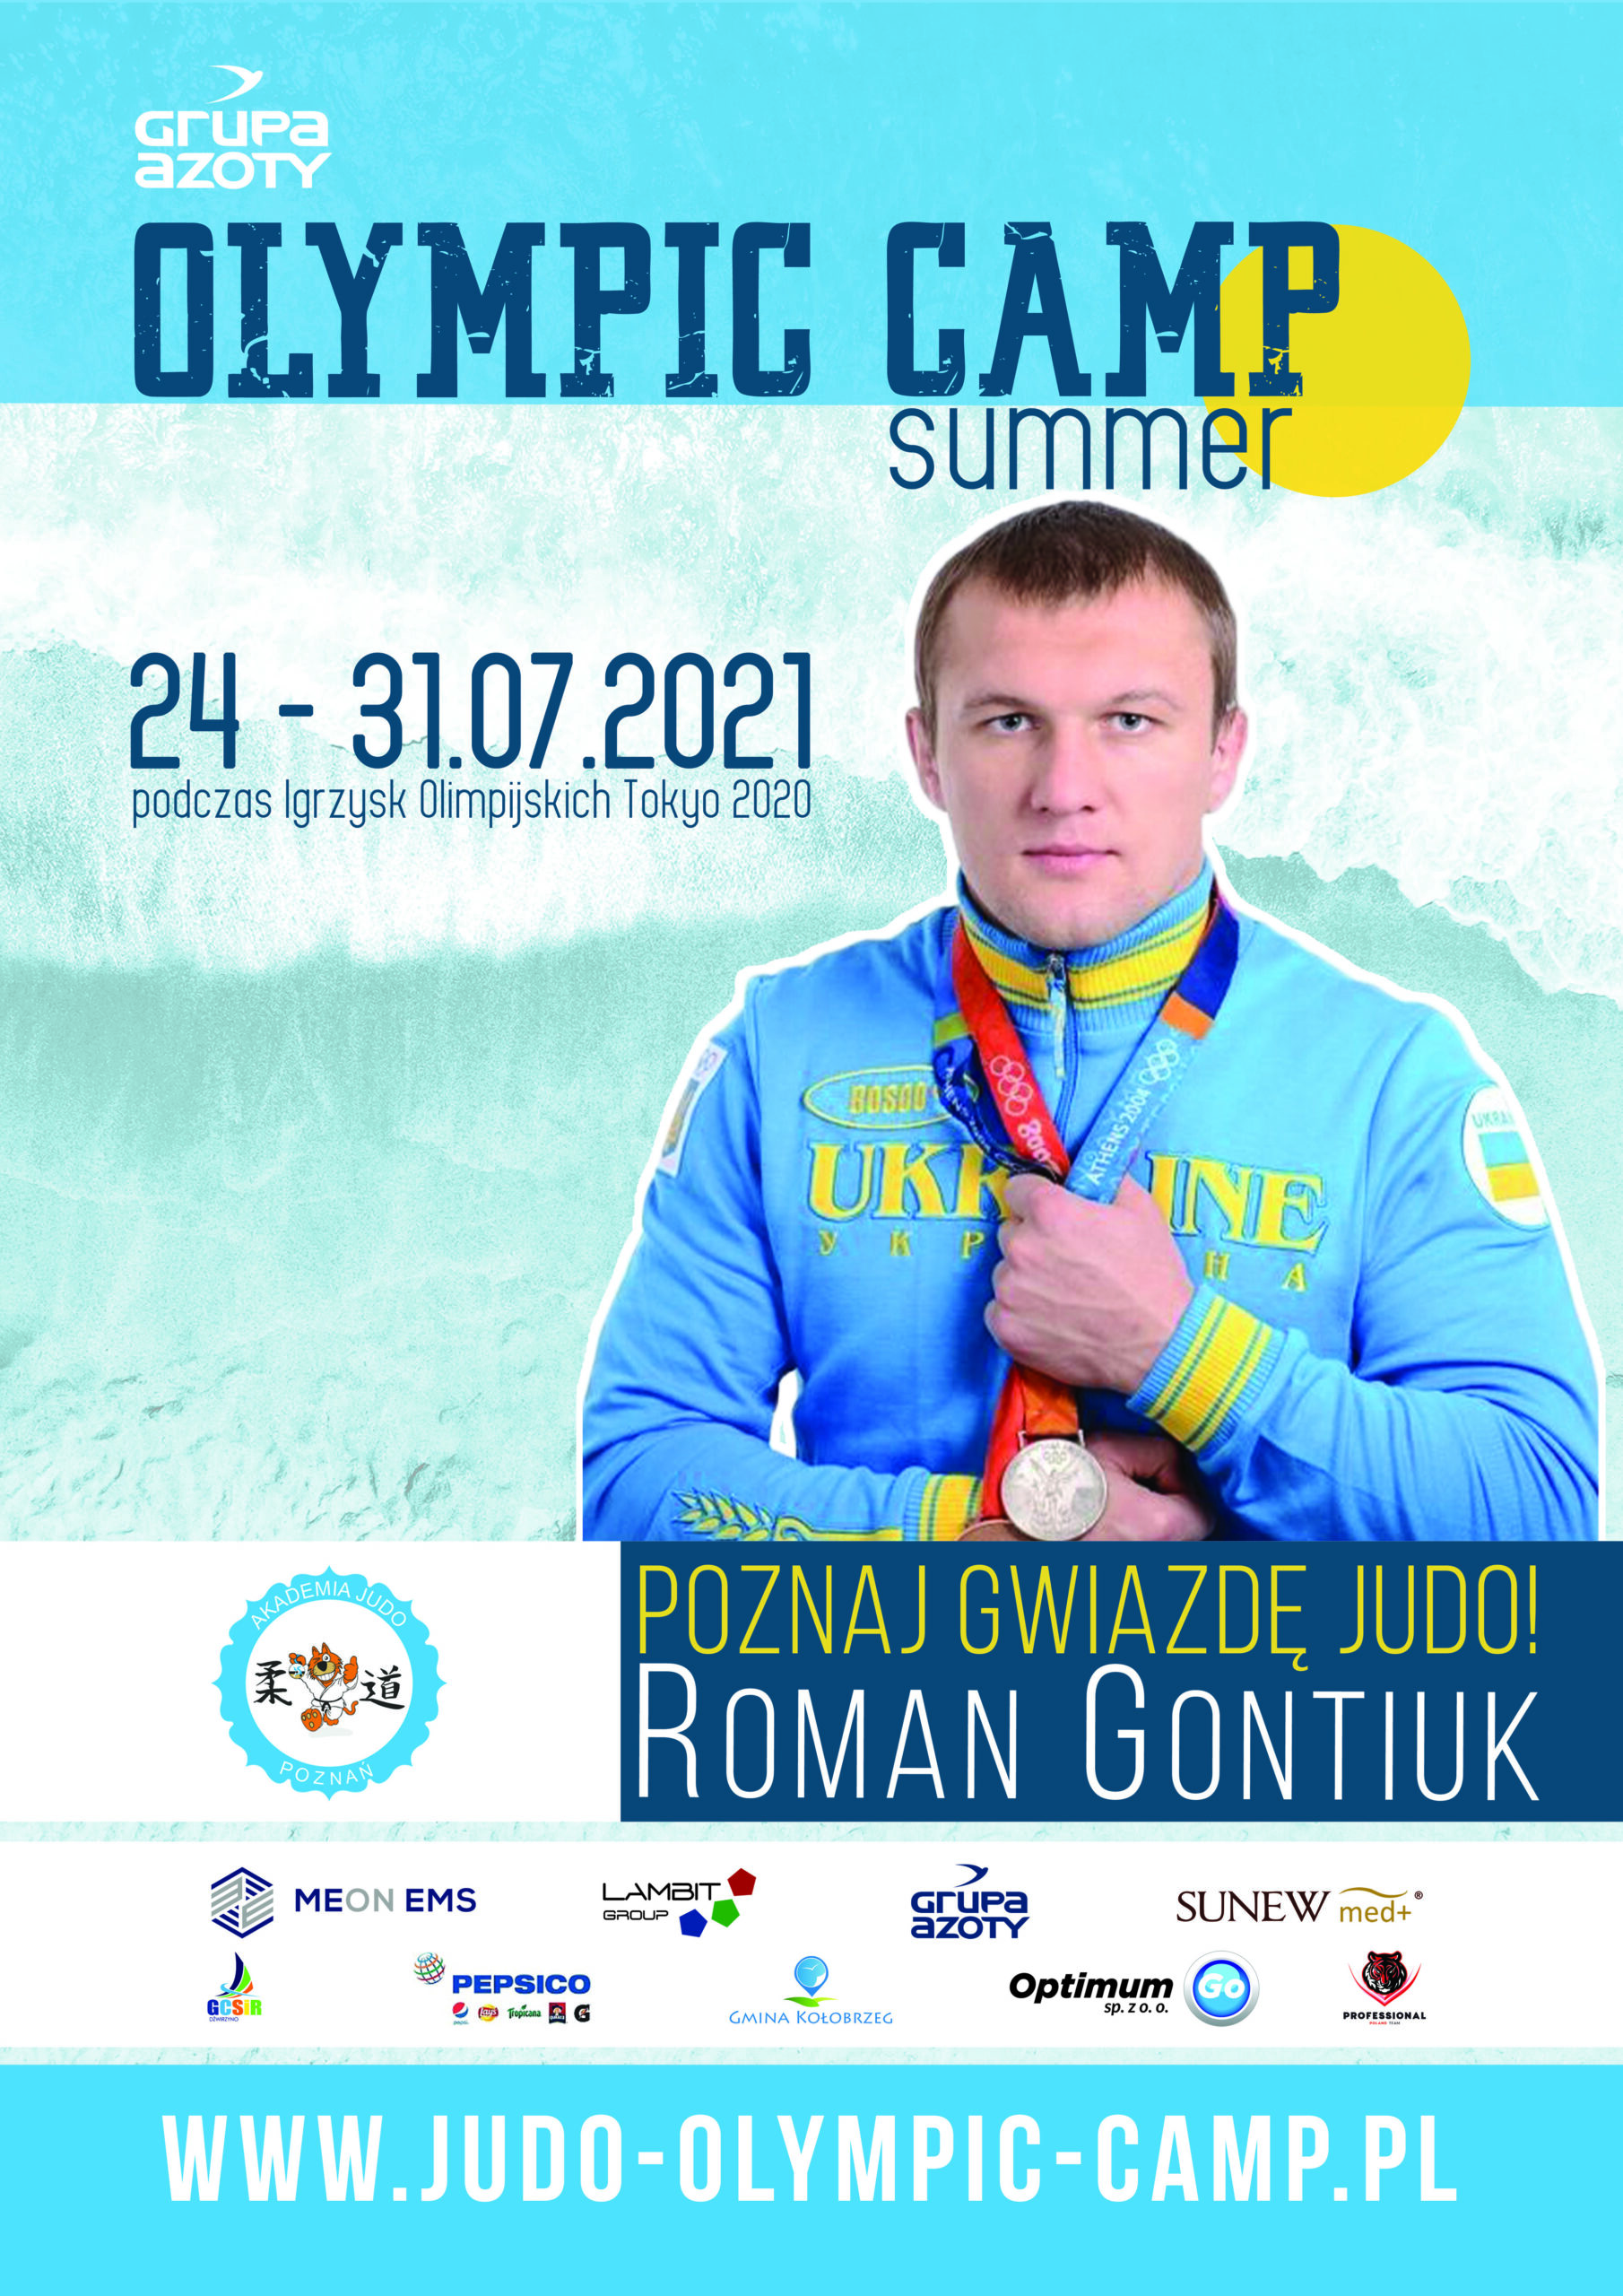 Summer Olimpic Camp